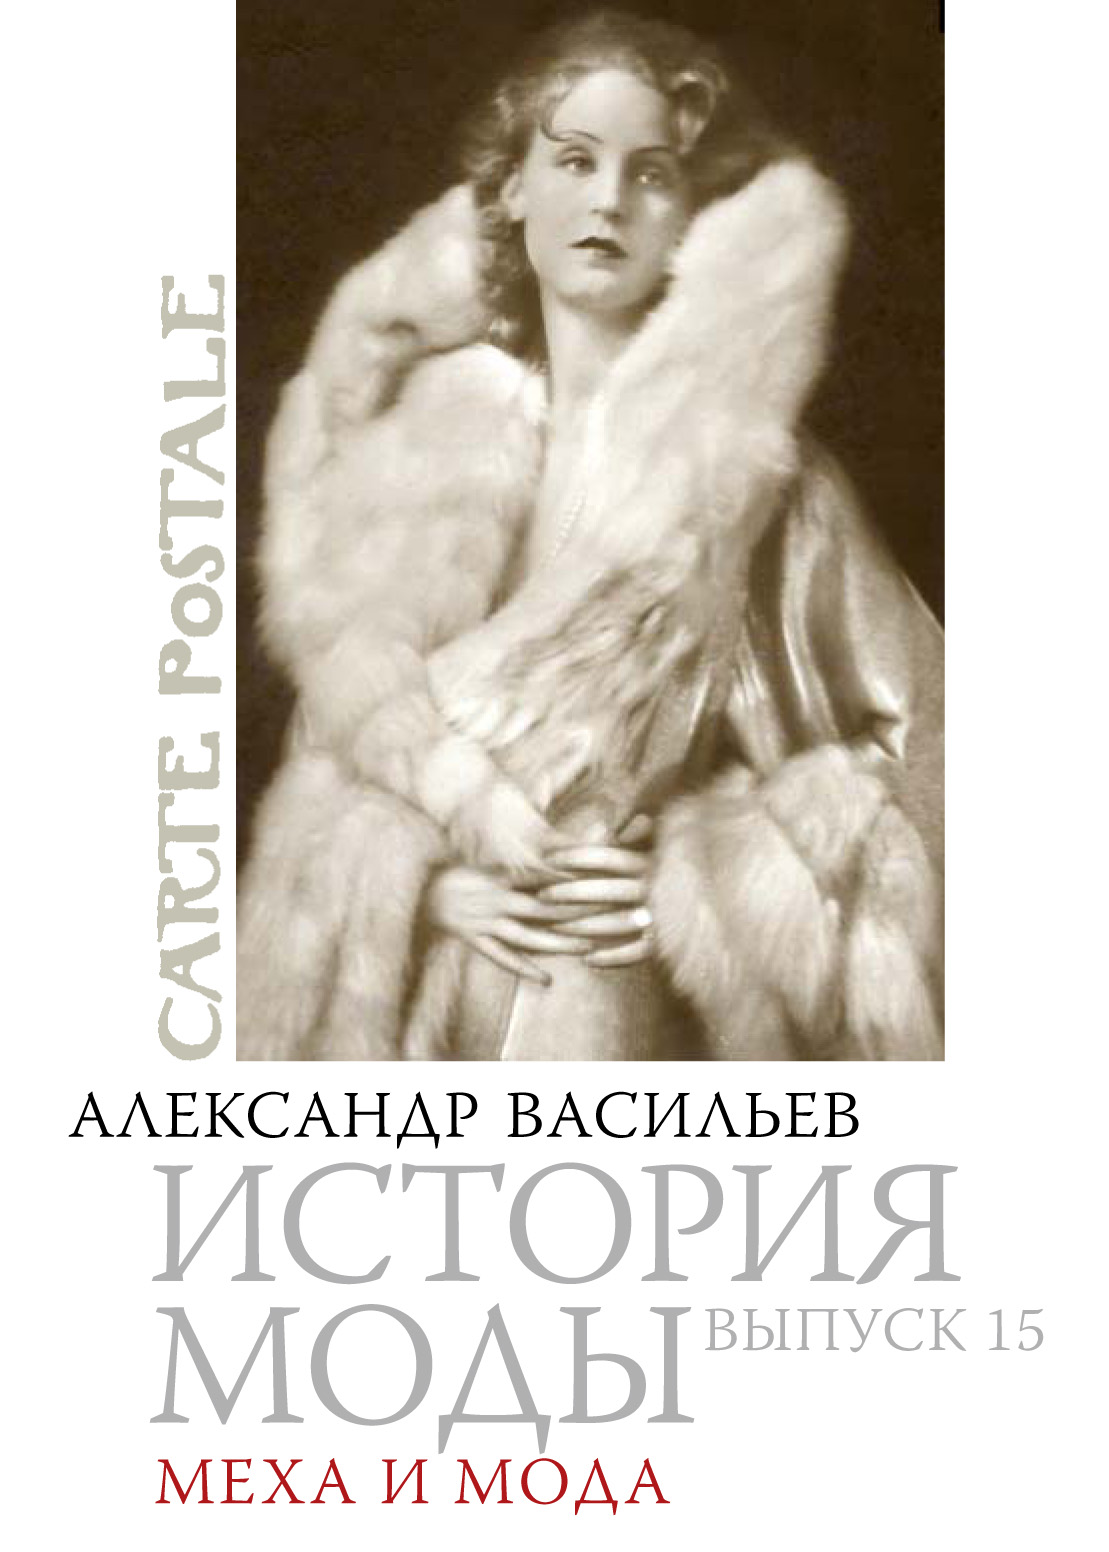 Александр Васильев Меха и мода